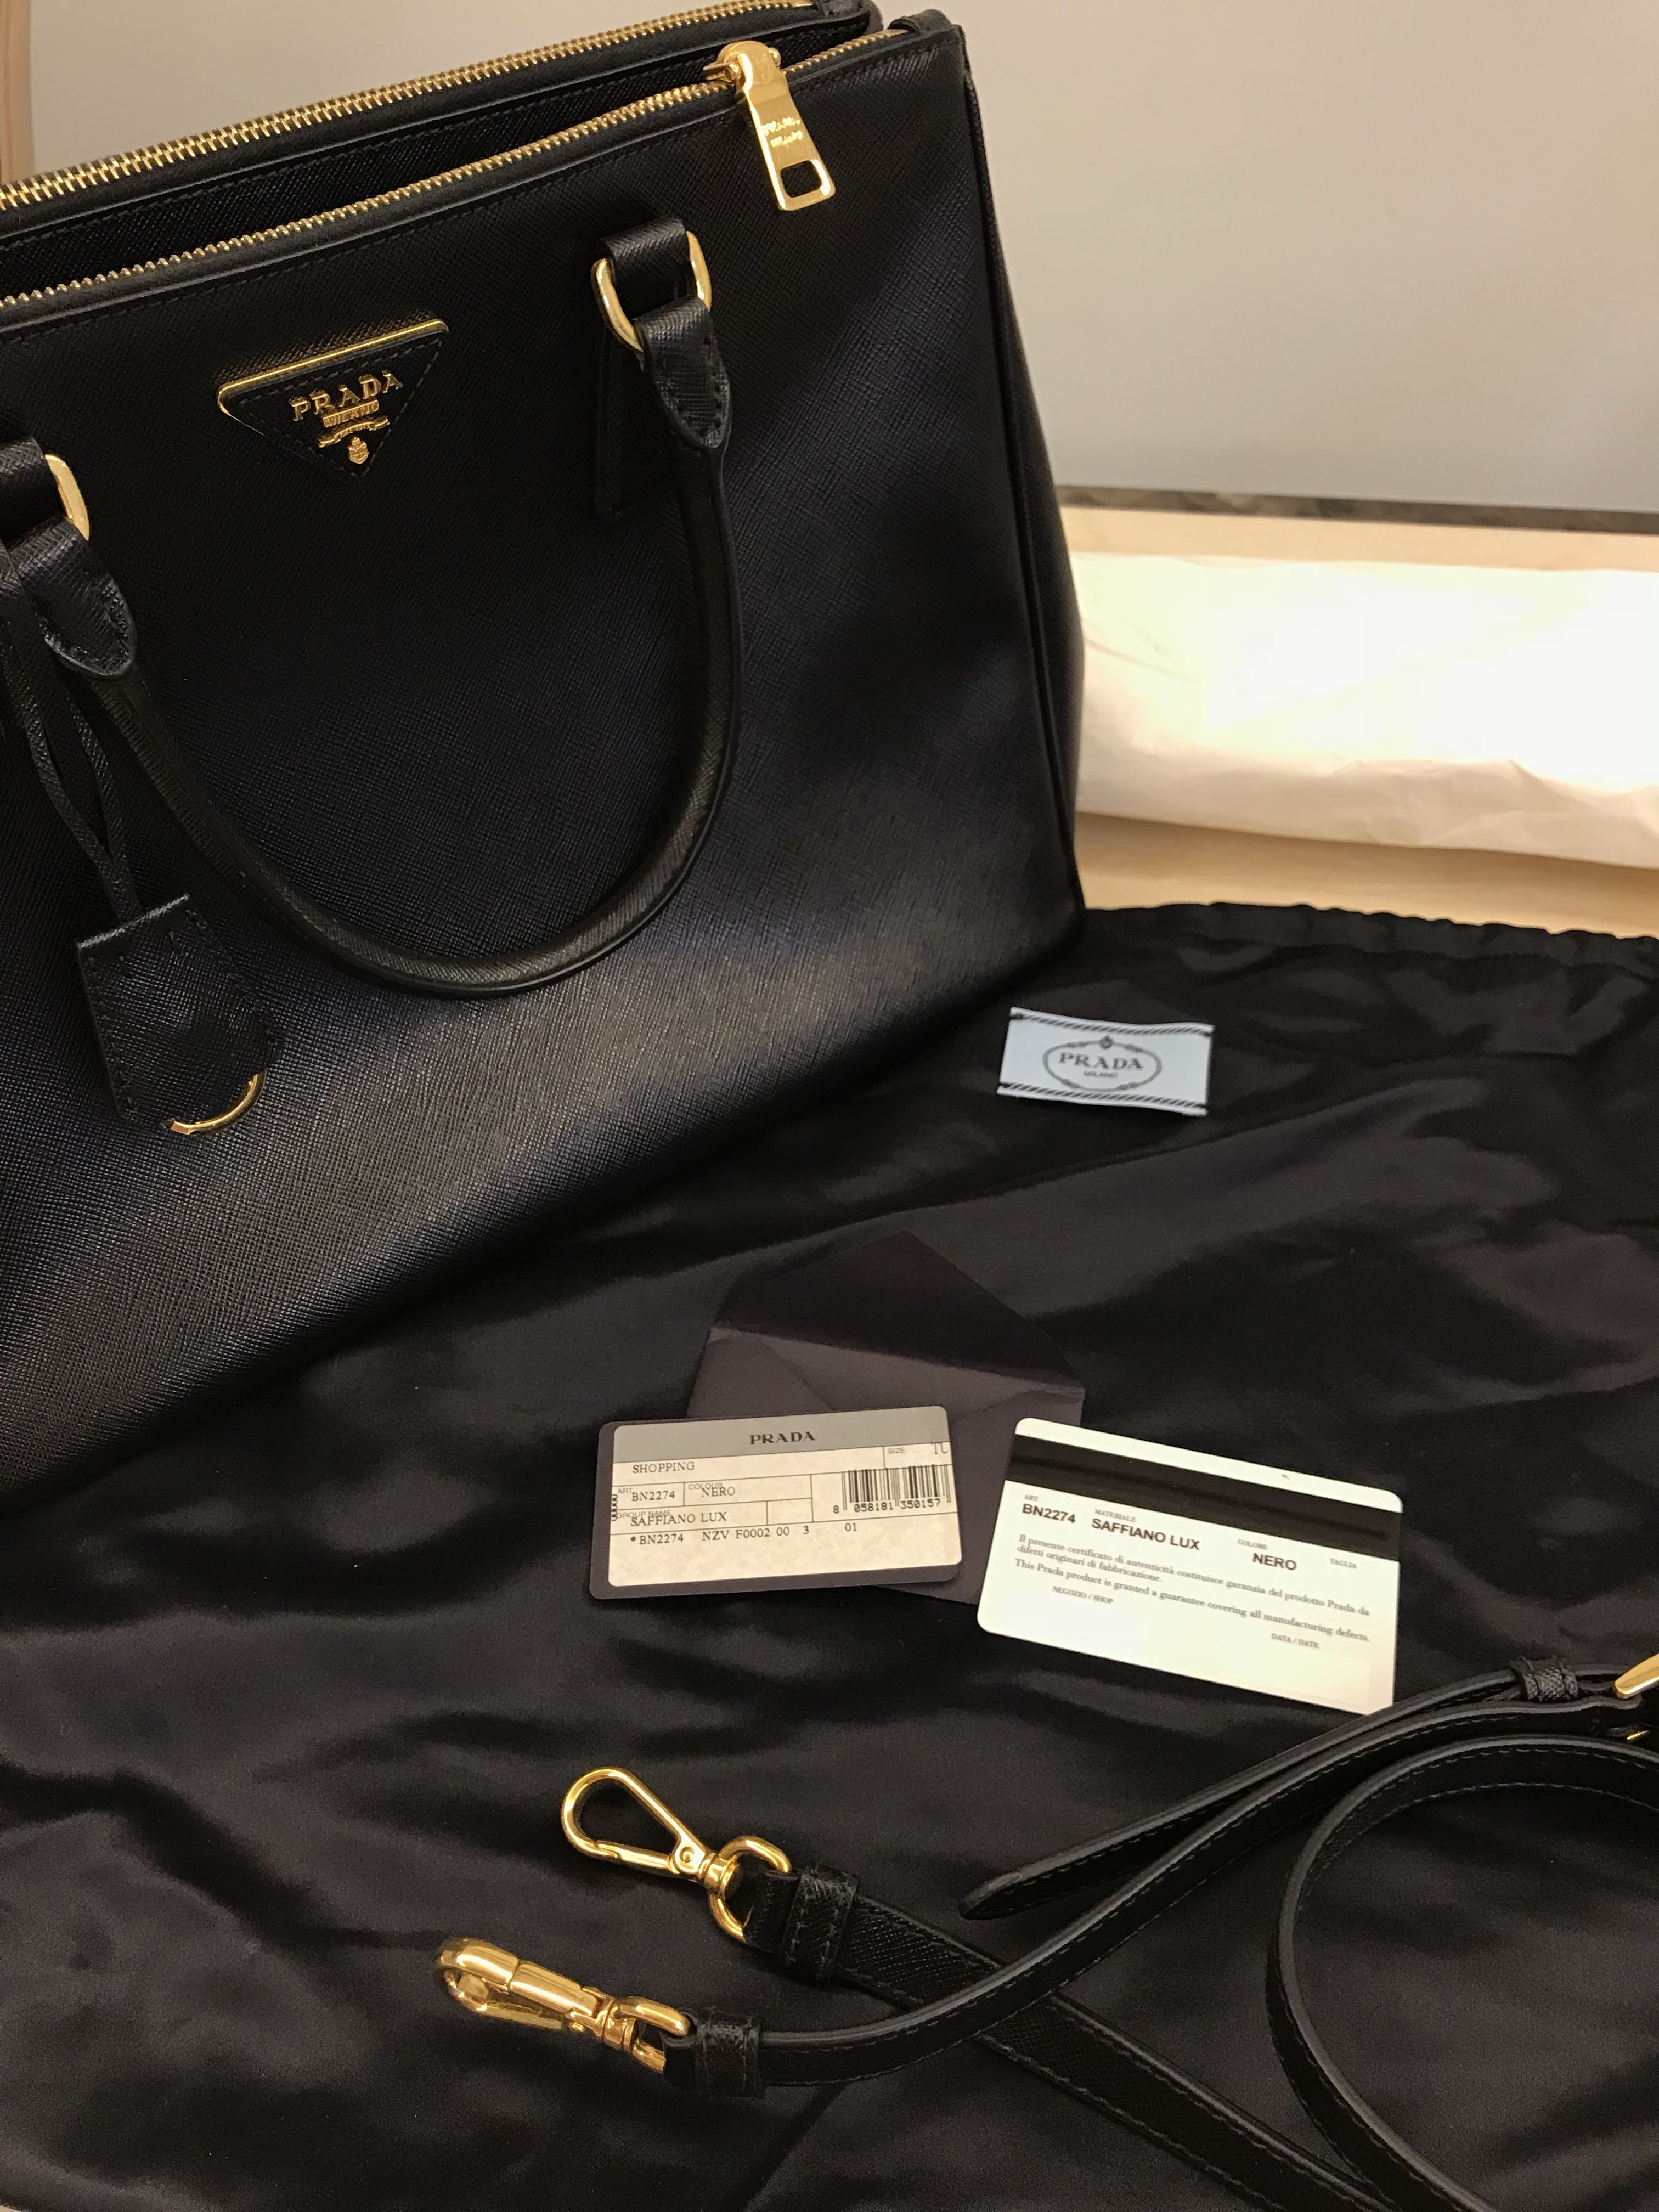 a2e99df948af Prada Saffiano bag 28cm, Luxury, Bags & Wallets, Handbags on Carousell